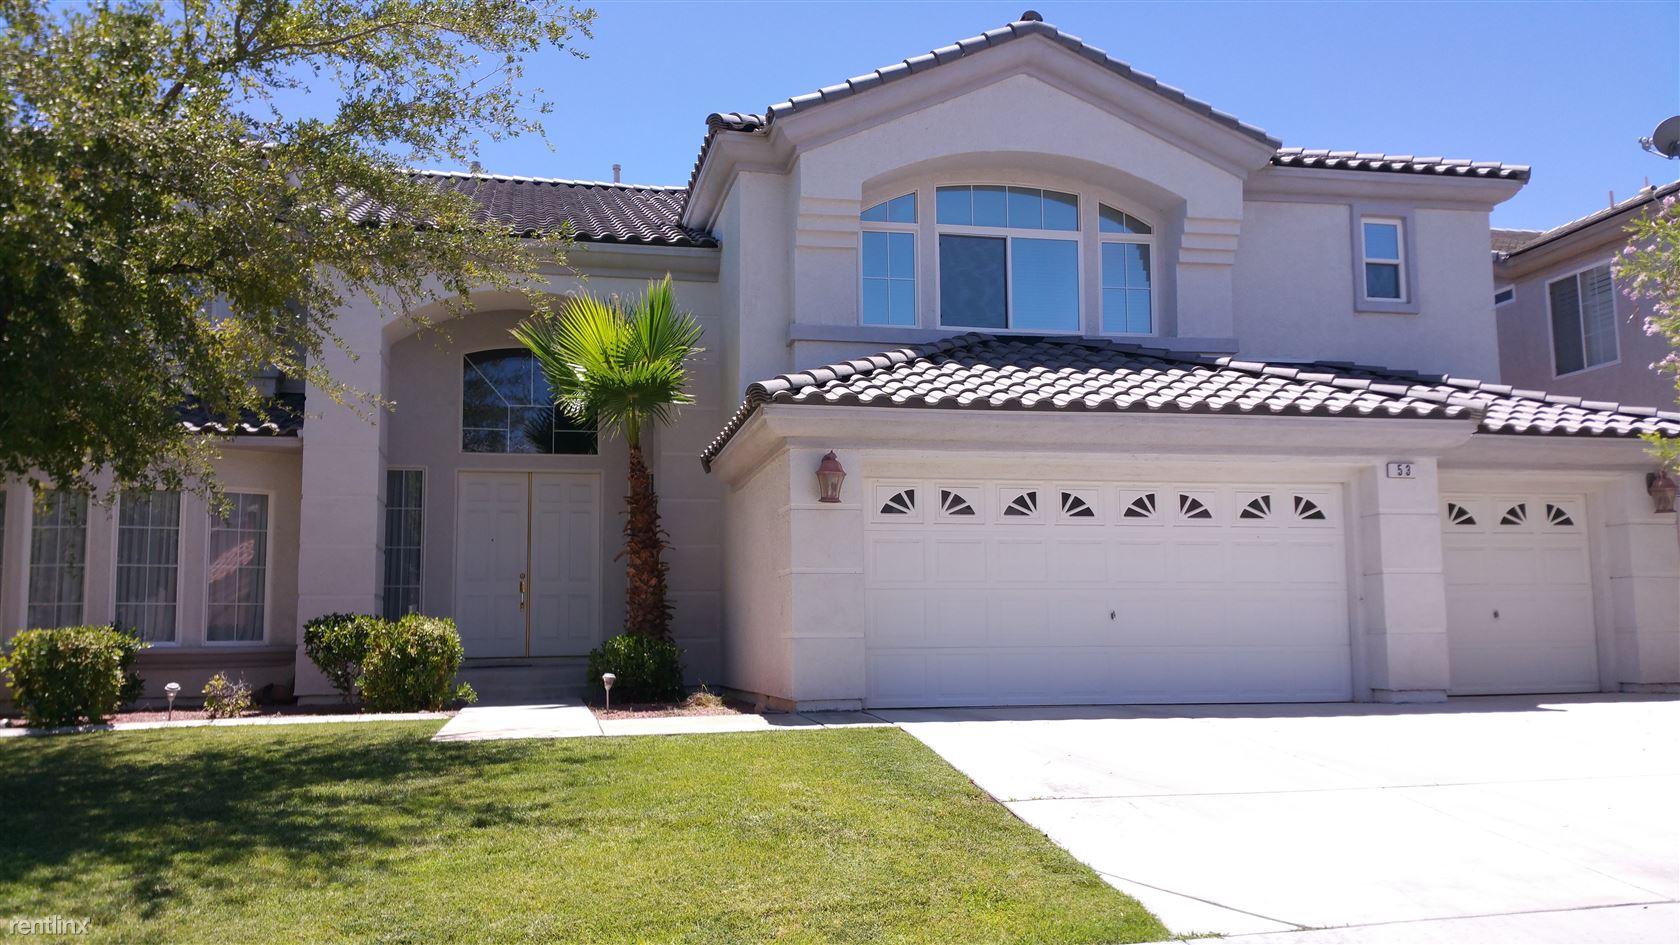 53 Misty Springs Ct., Las Vegas, NV - $3,500